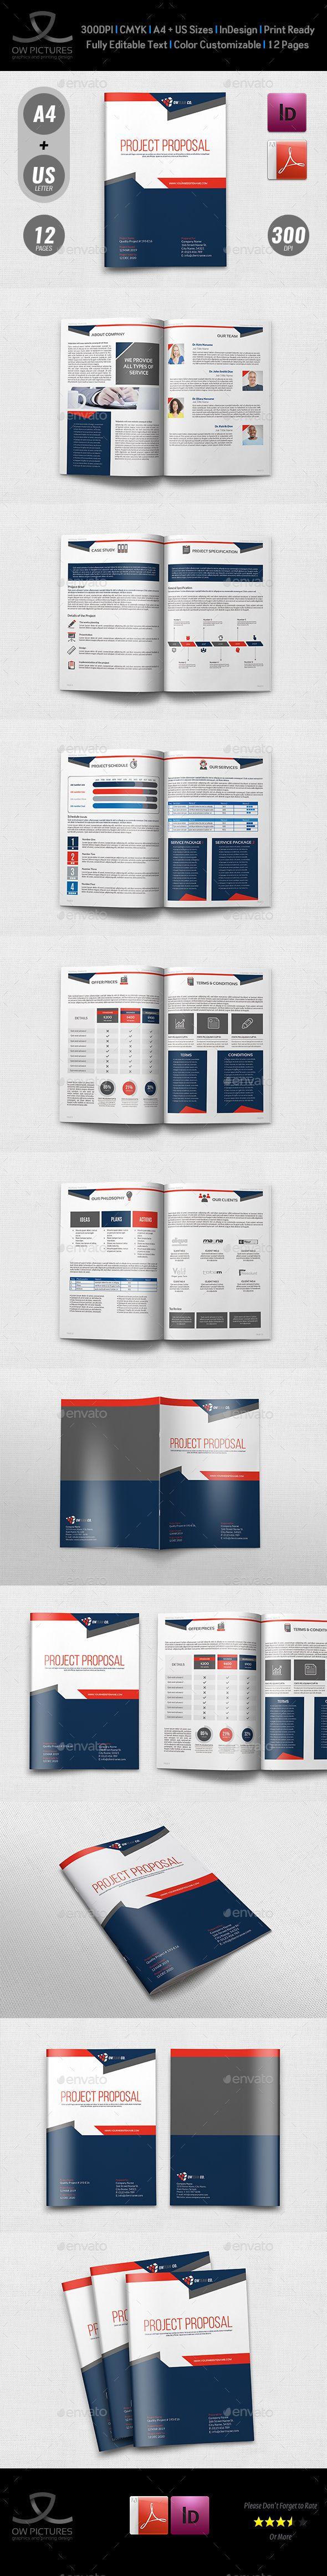 Company Proposal Template Vol.4 | Pinterest